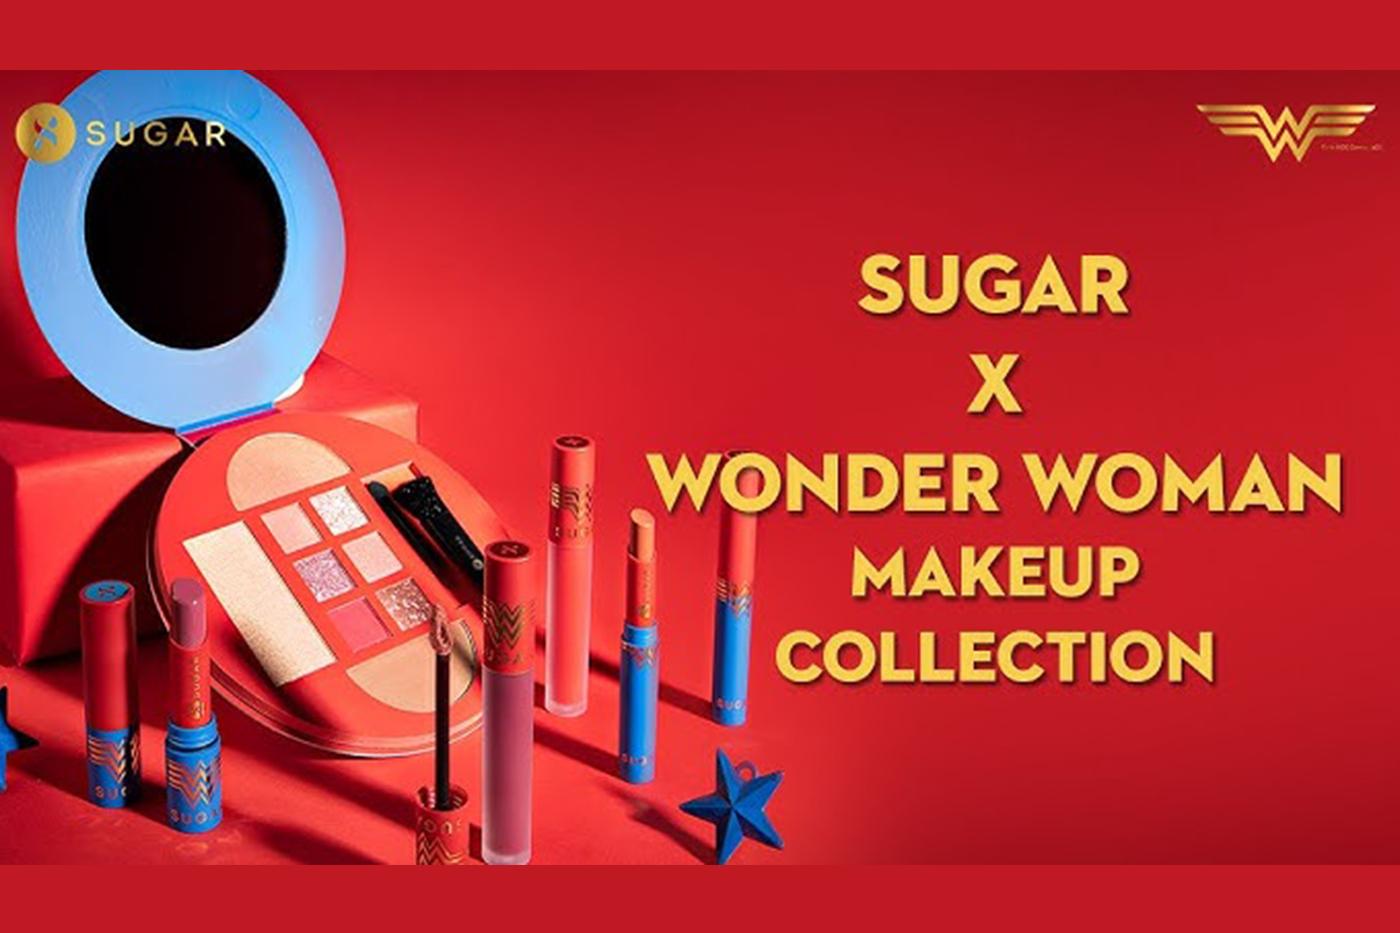 Sugar Cosmetics launches Sugar X Wonder Woman Collection